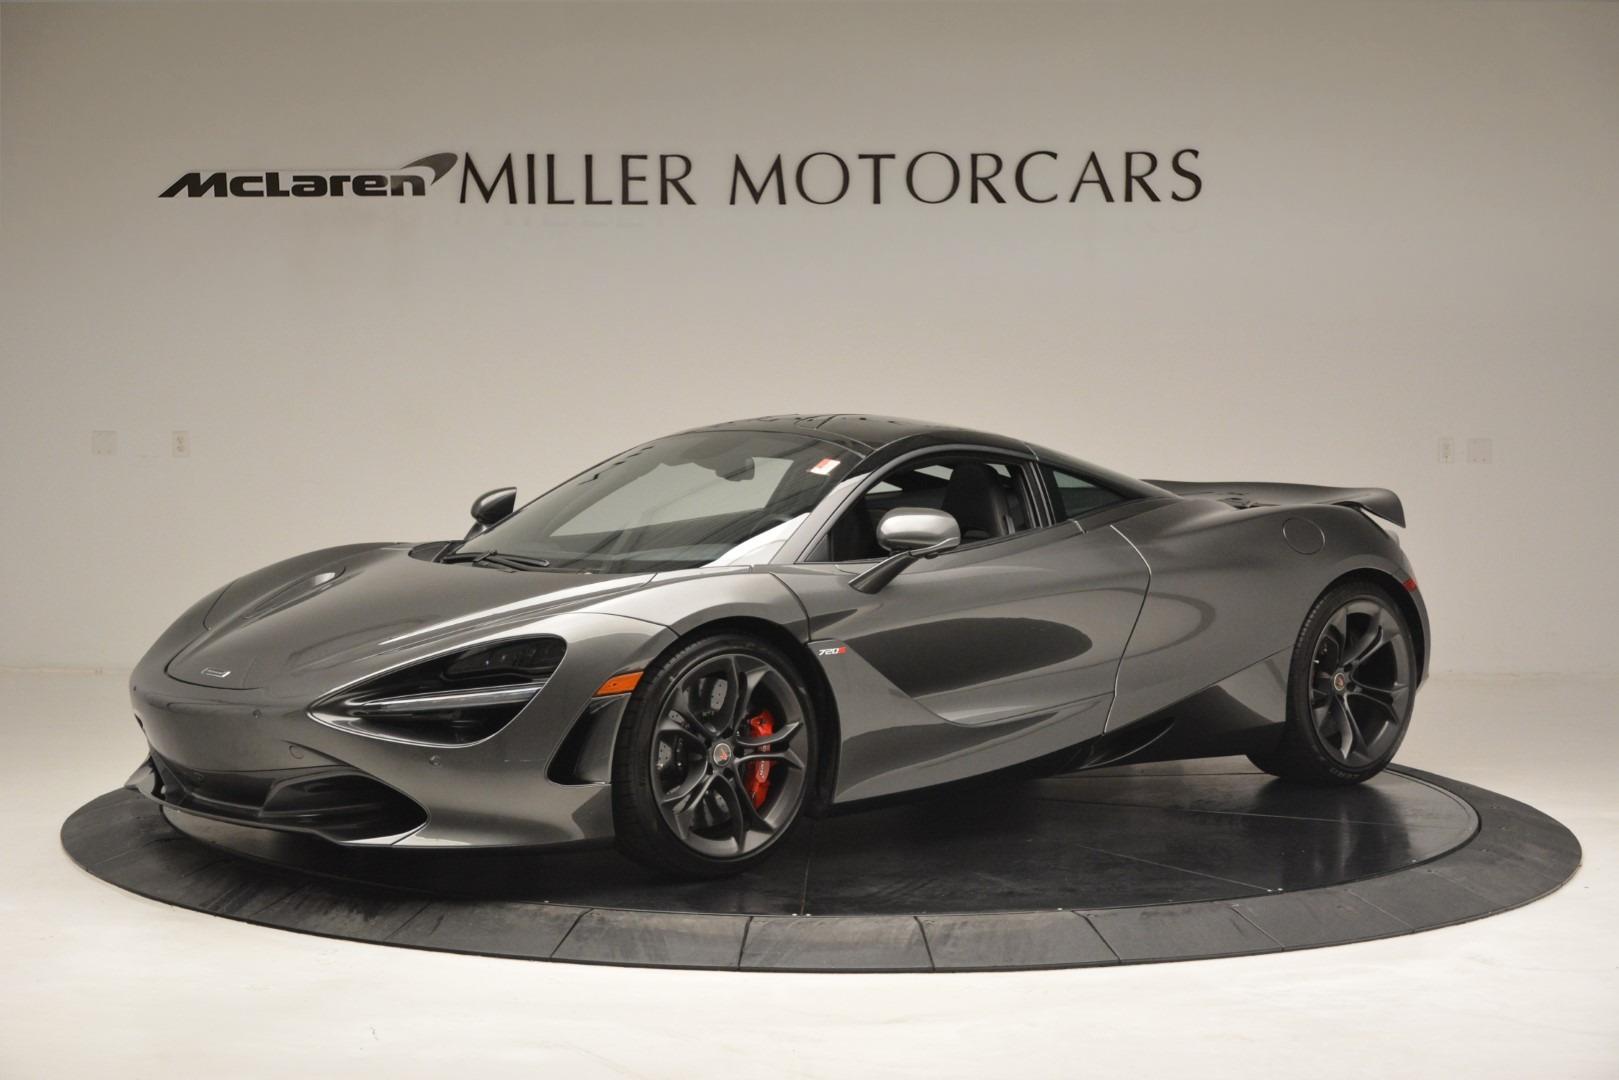 Used 2018 McLaren 720S for sale $269,900 at Alfa Romeo of Westport in Westport CT 06880 1